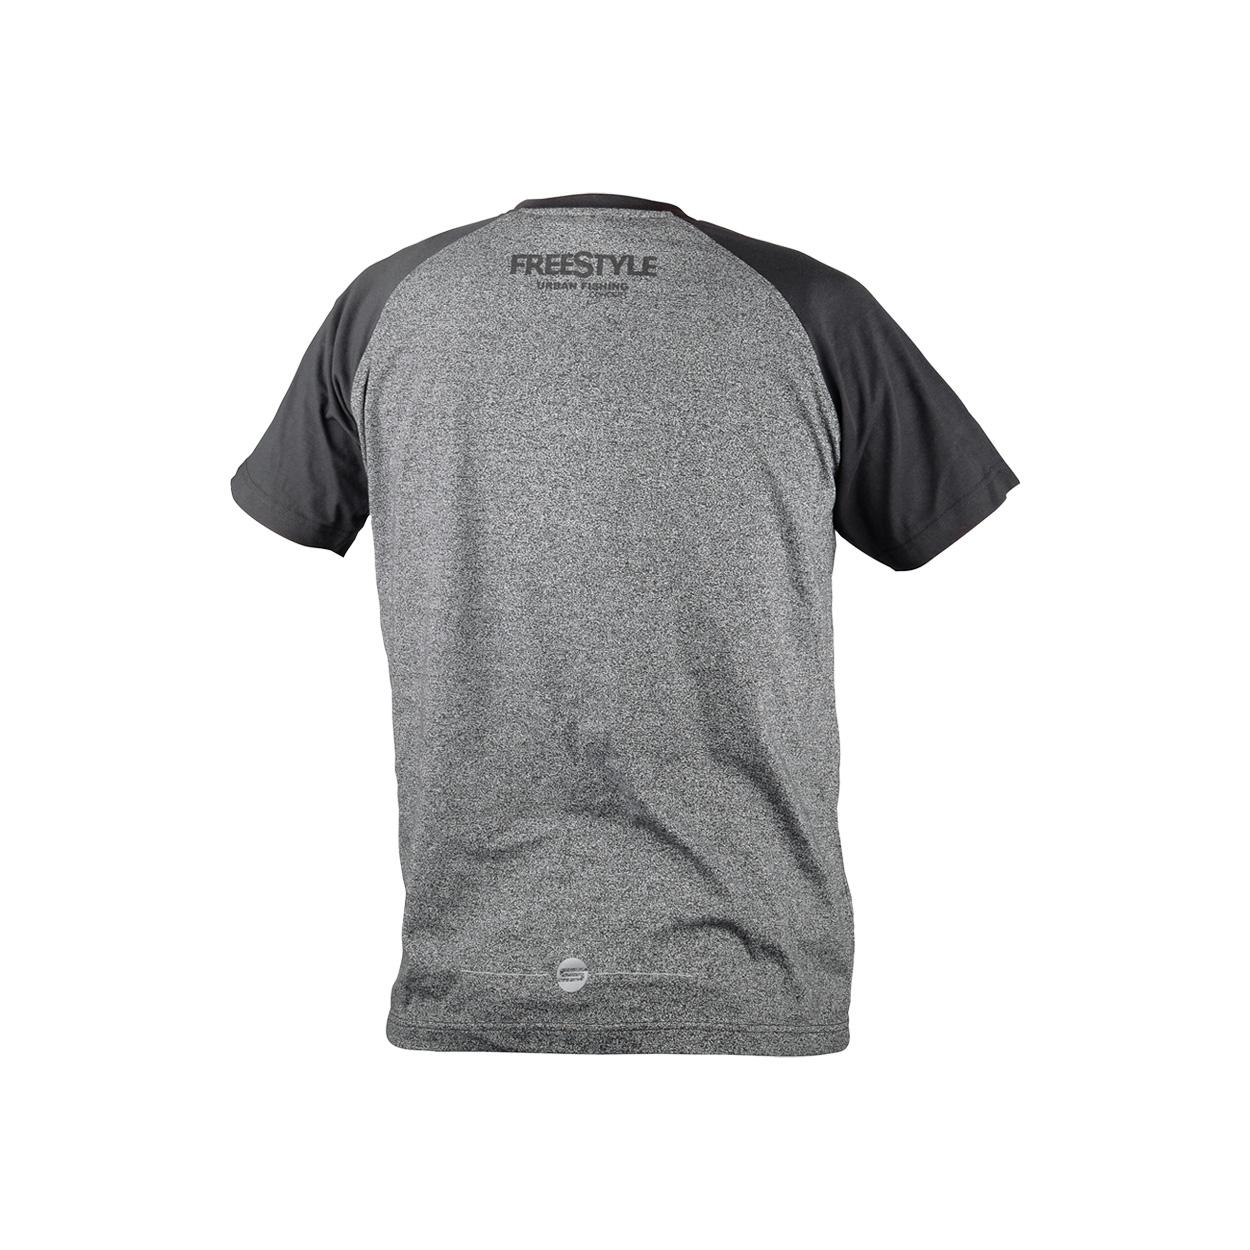 Freestyle - T-Shirt - Grey 02